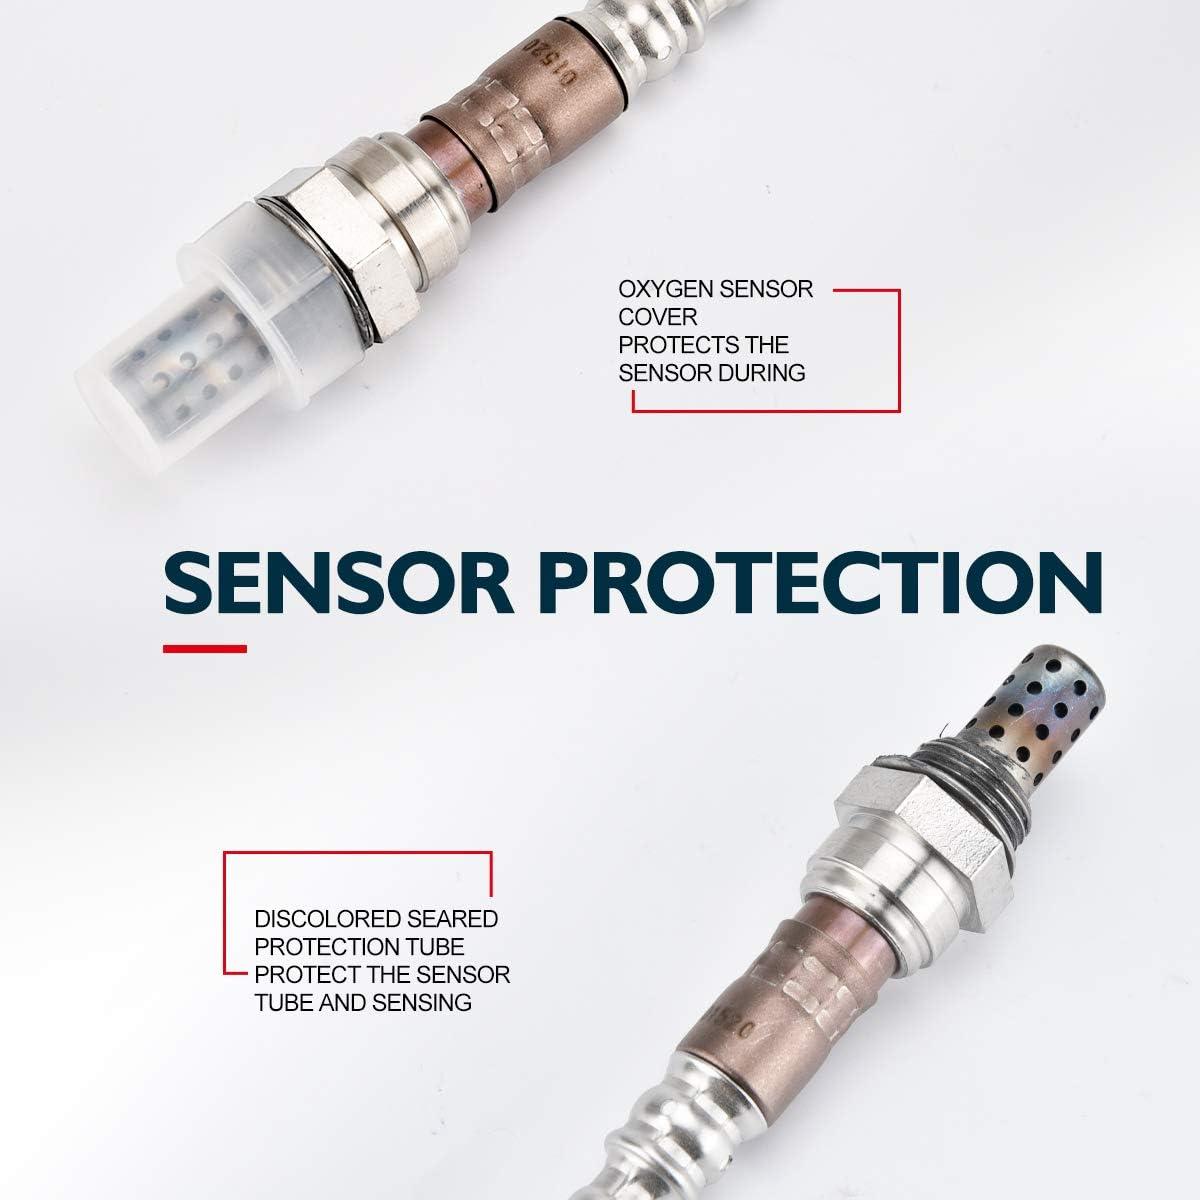 Honda Accord//Civic//Odyssey Original Equipment Replacement 250-24011 O2 Sensor Up//Downstream Compatible for Acura CX//NSX//Intrgra KAX SG336 Oxygen Sensor